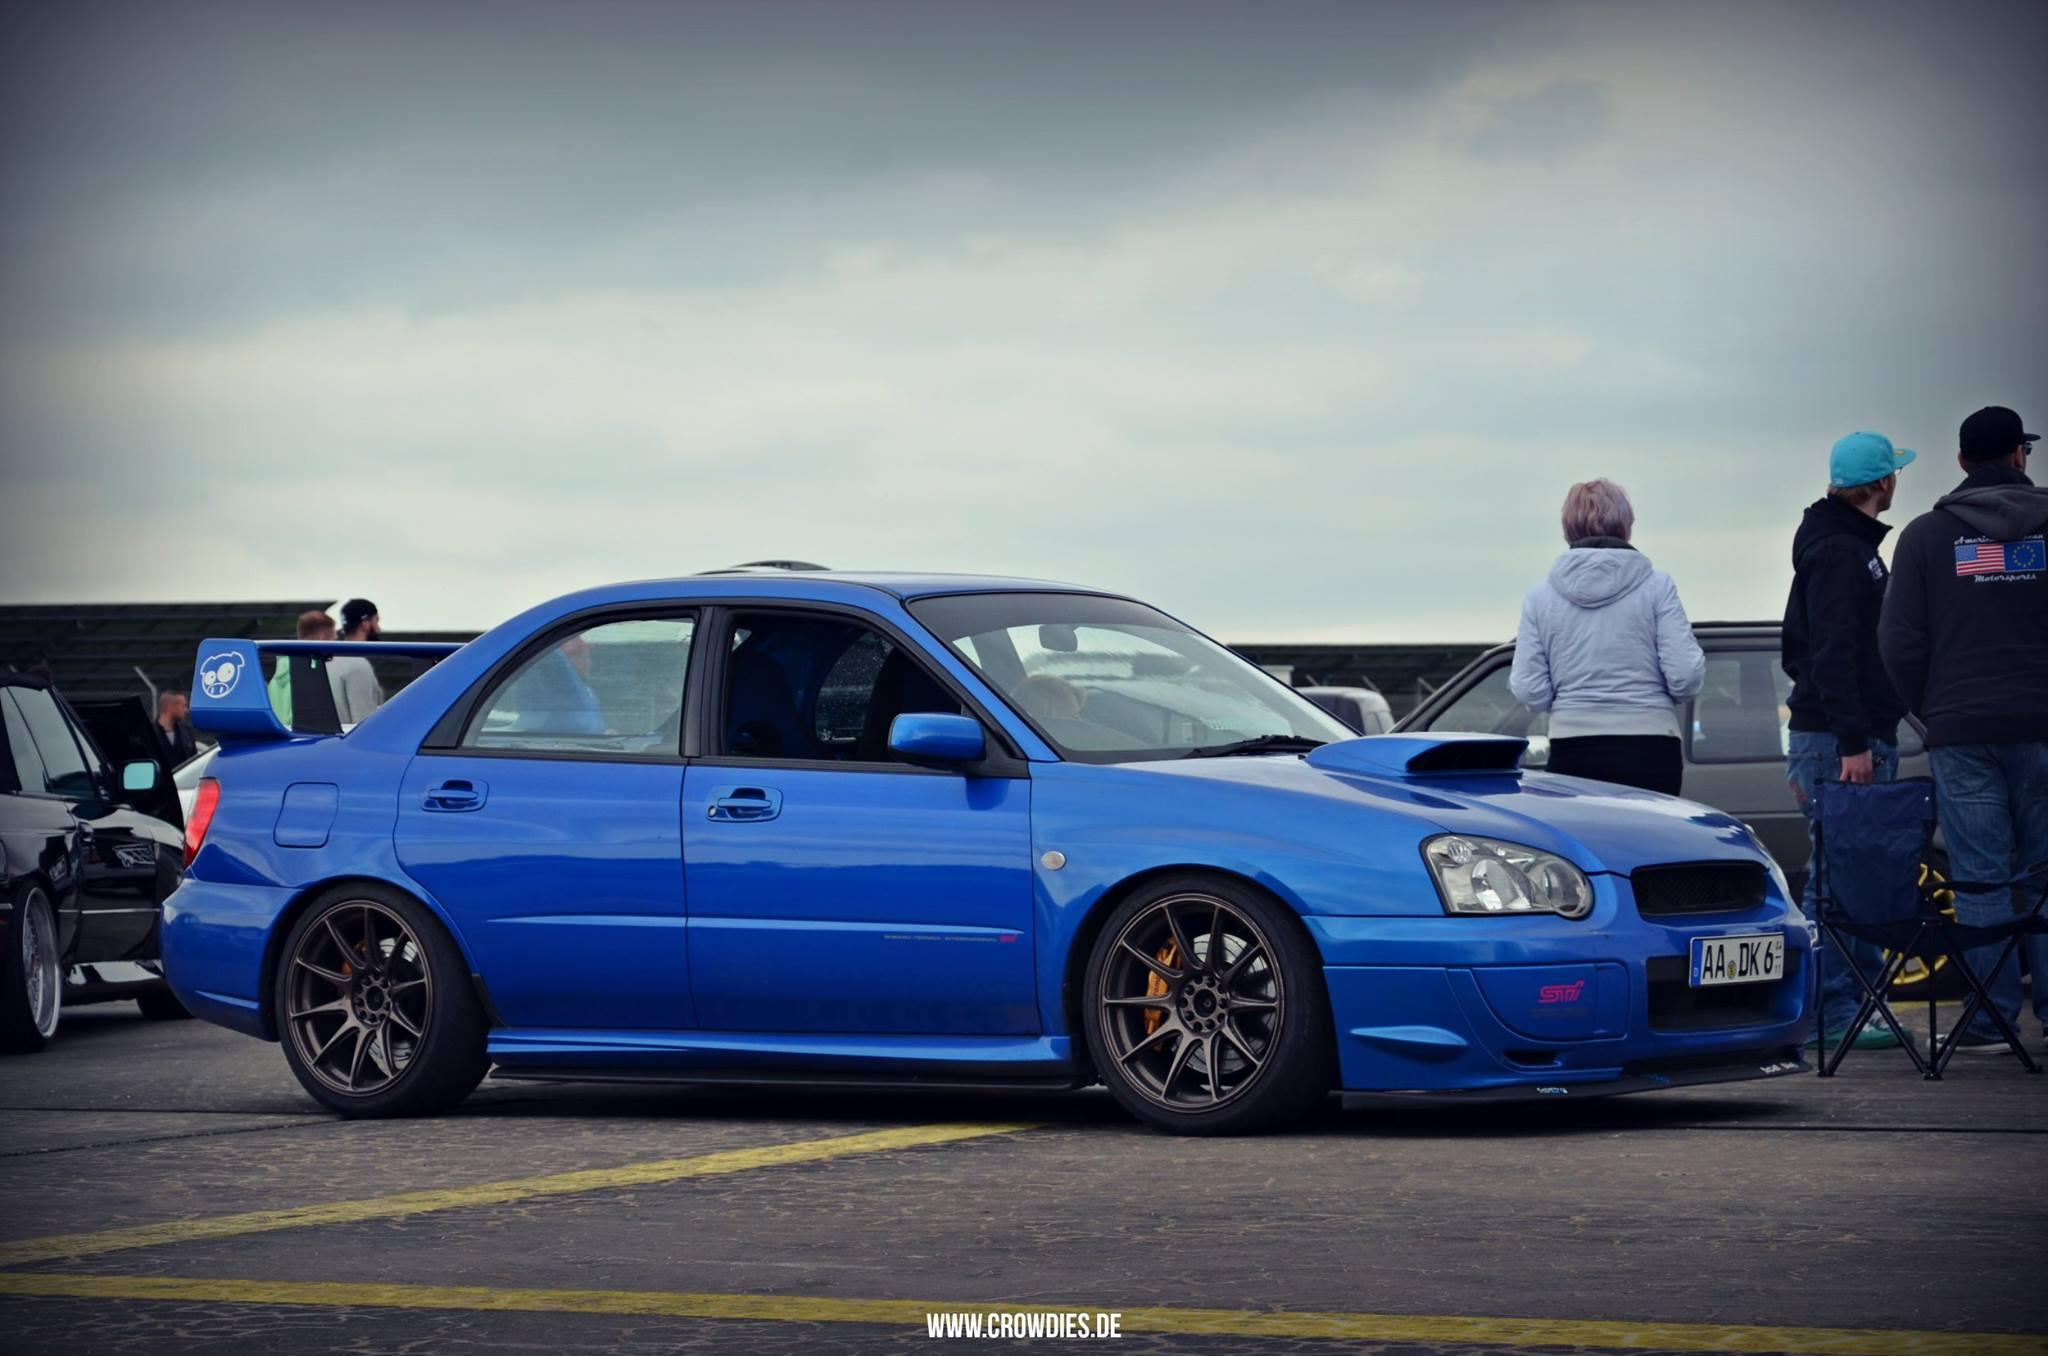 Meet & Grill 6.0 - Subaru Impreza STI